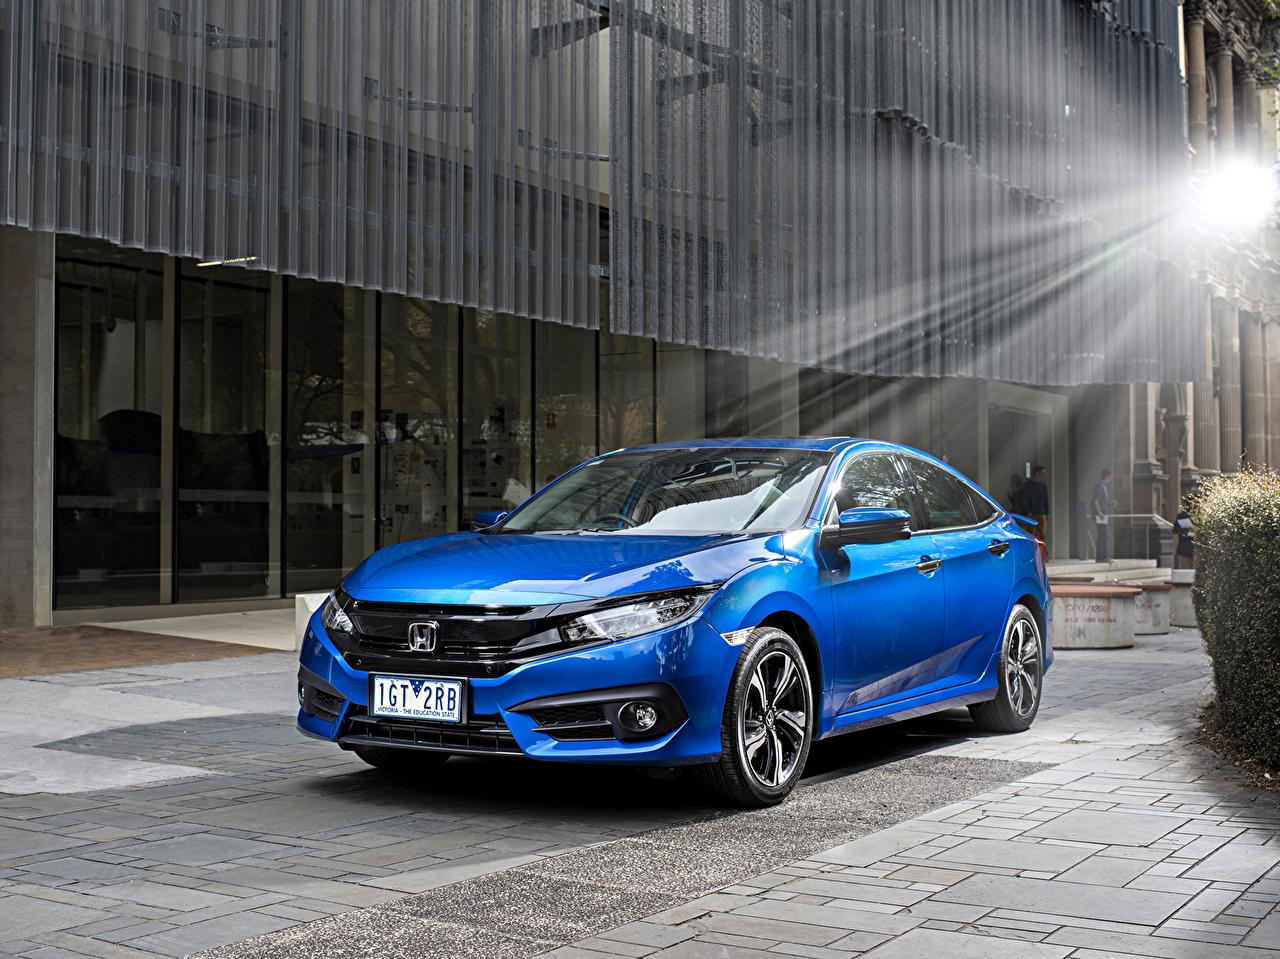 Kia Ceed Scoupe 1.6 CRDI preto - Página 10 Honda_2016_Civic_Sedan_495381